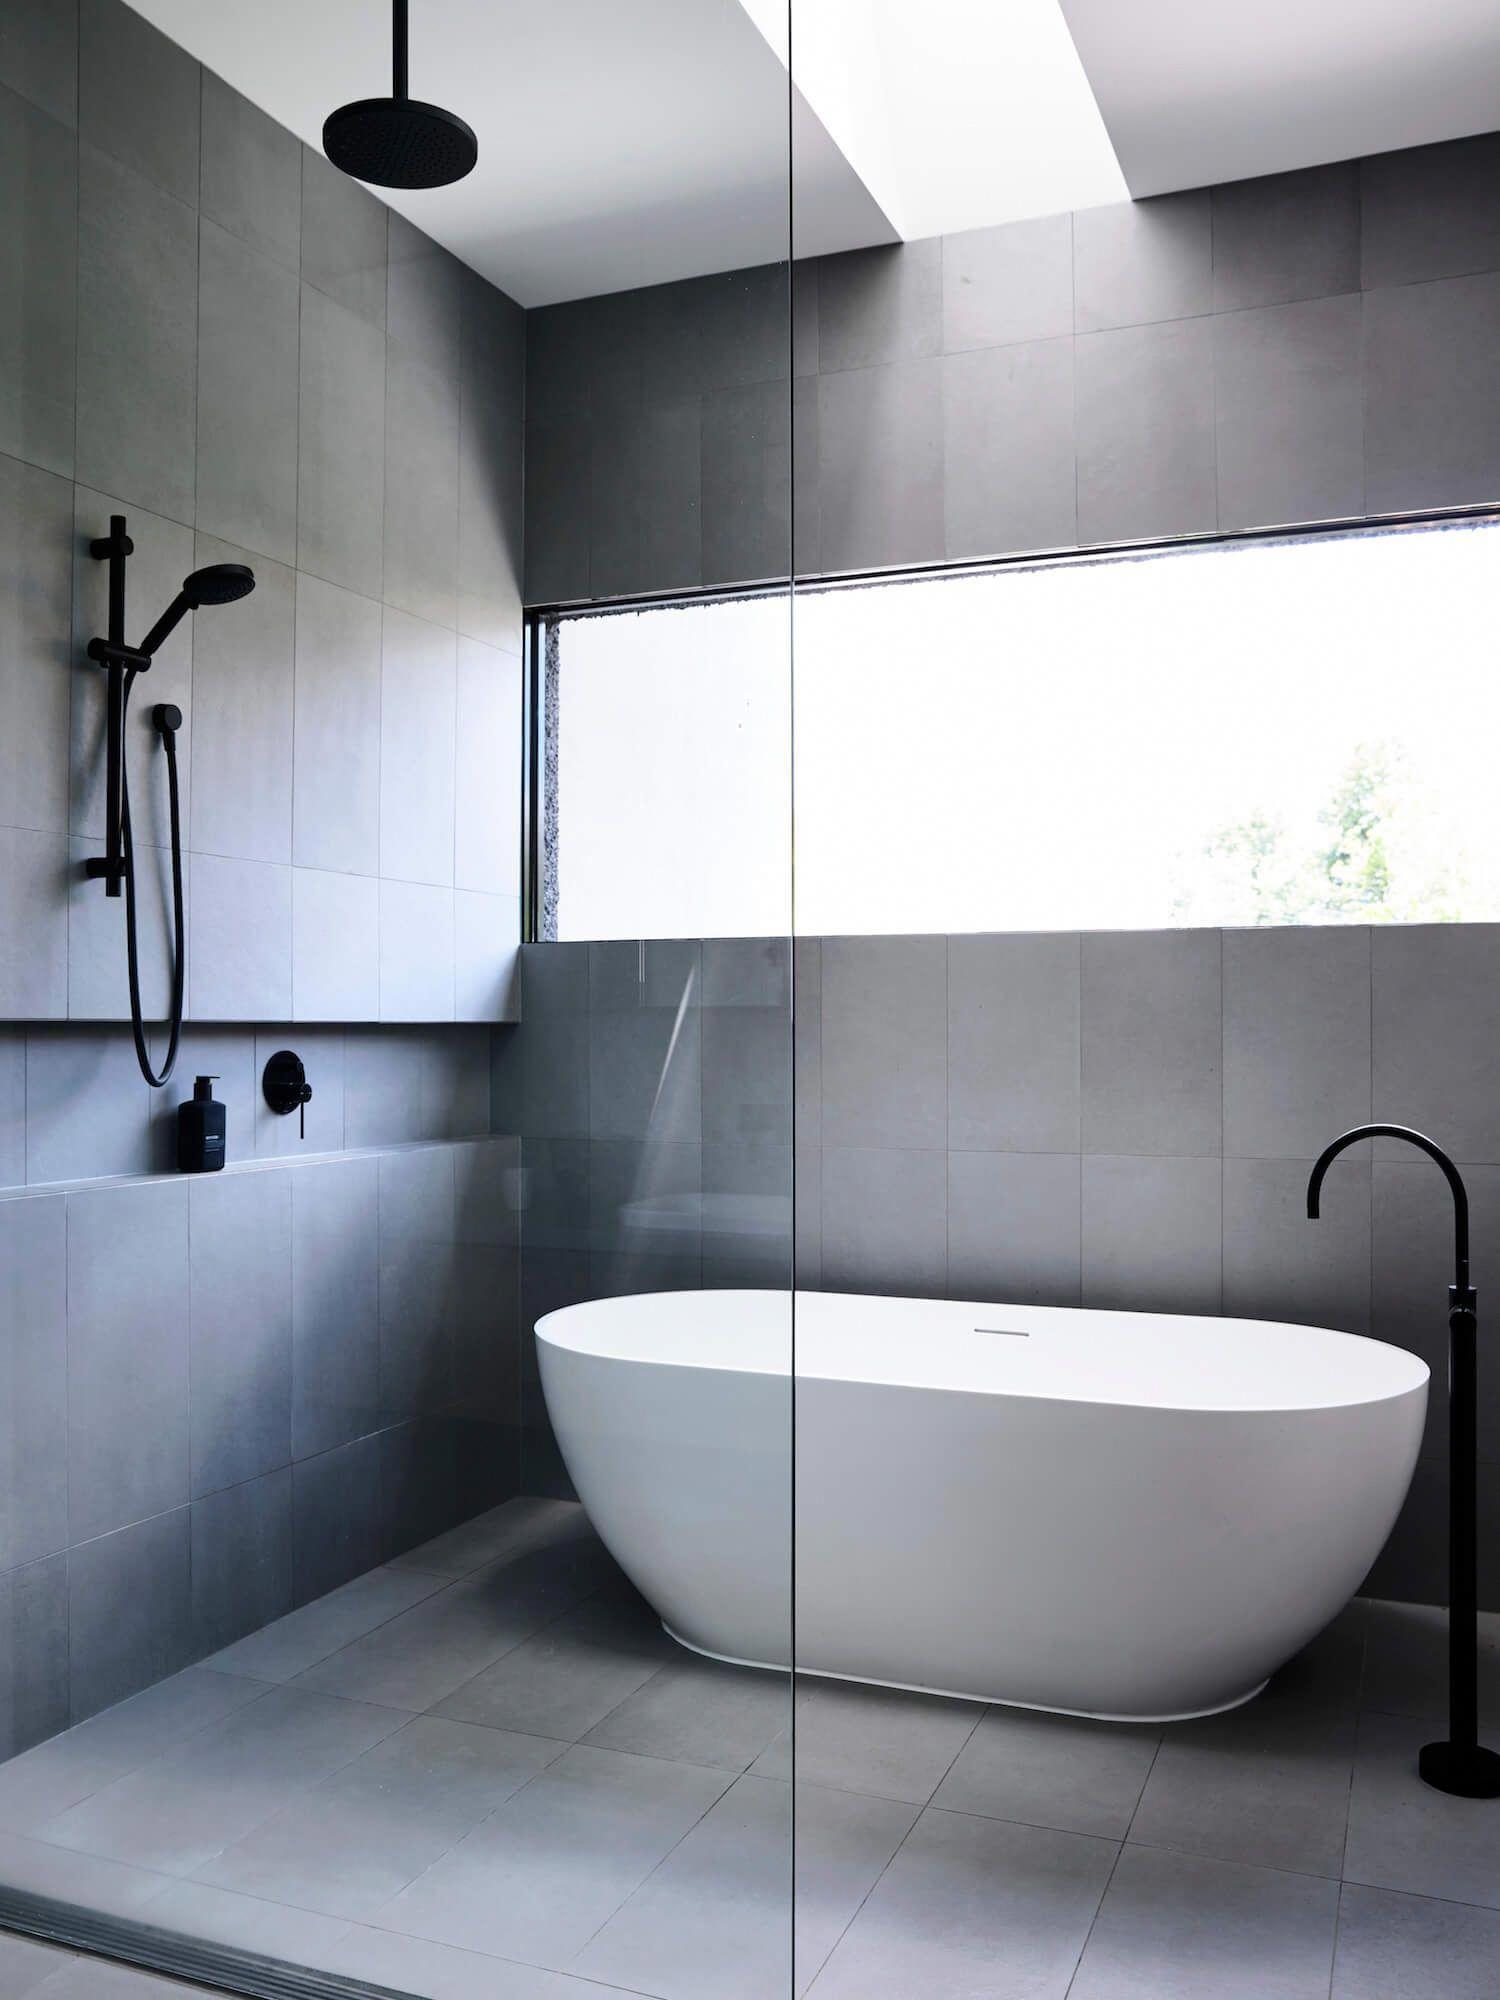 Badezimmer Remodeling Luxusbad Begehbaredusche Avec Images